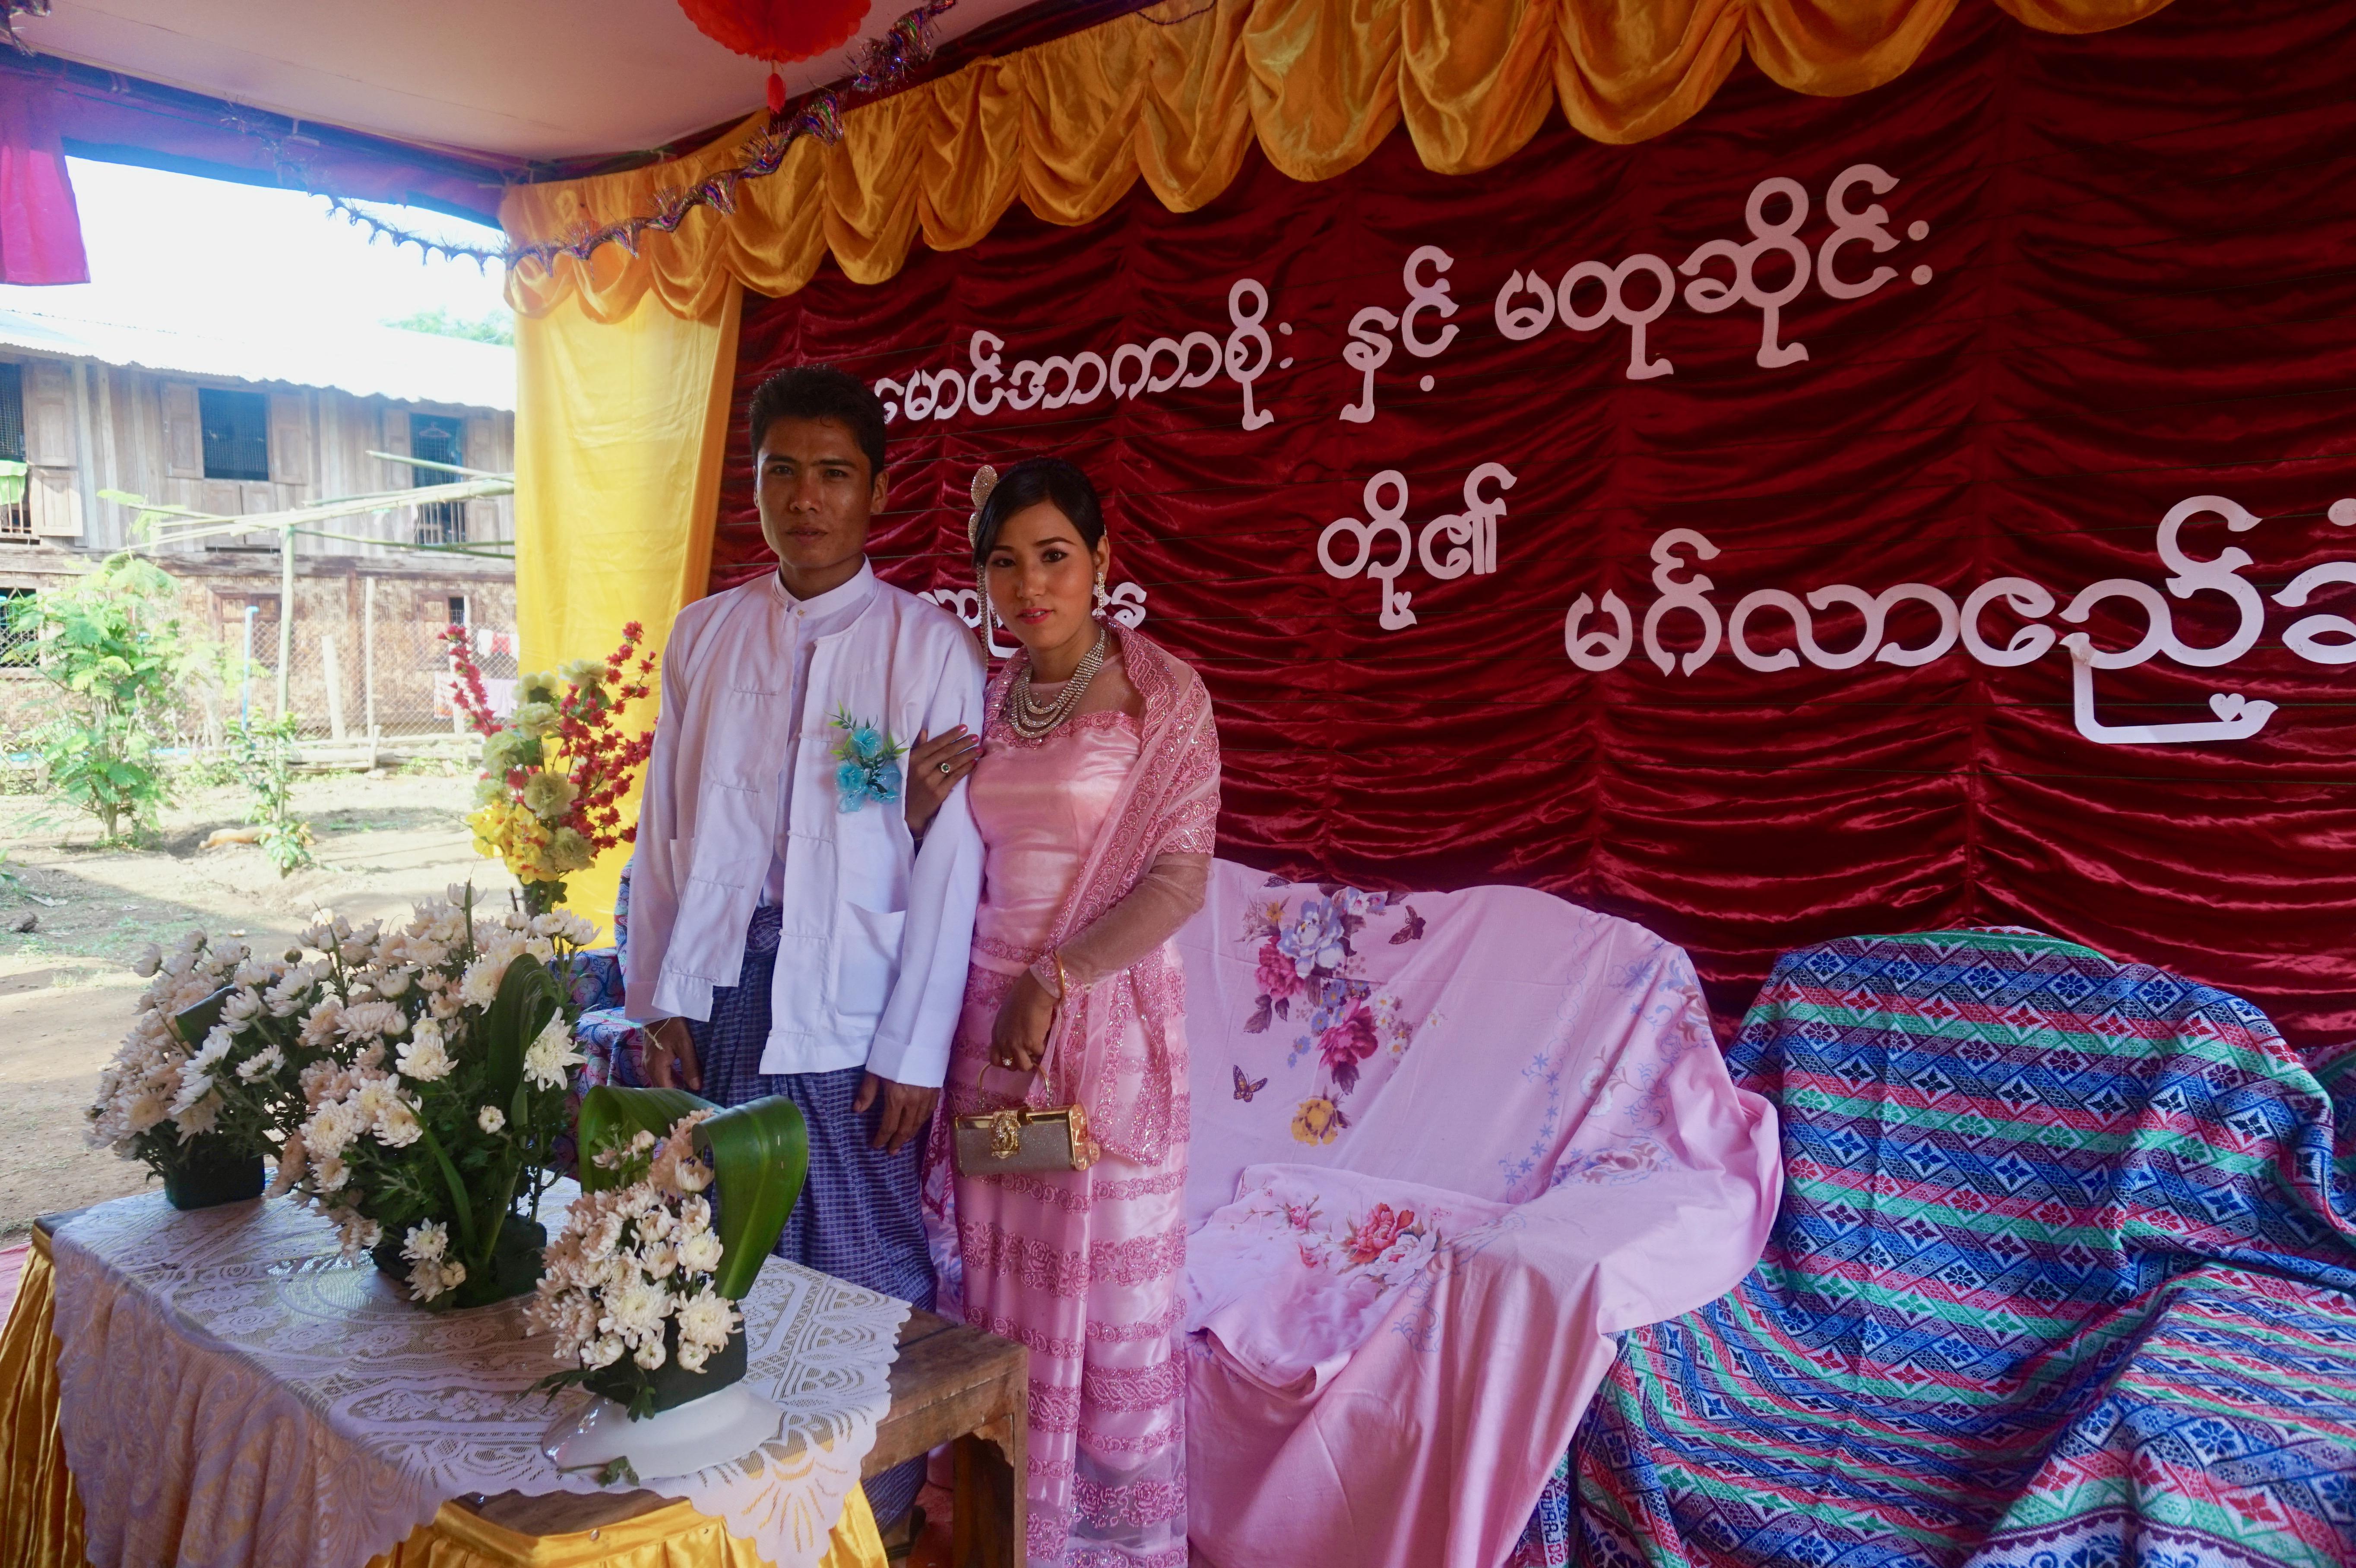 Burmese wedding party